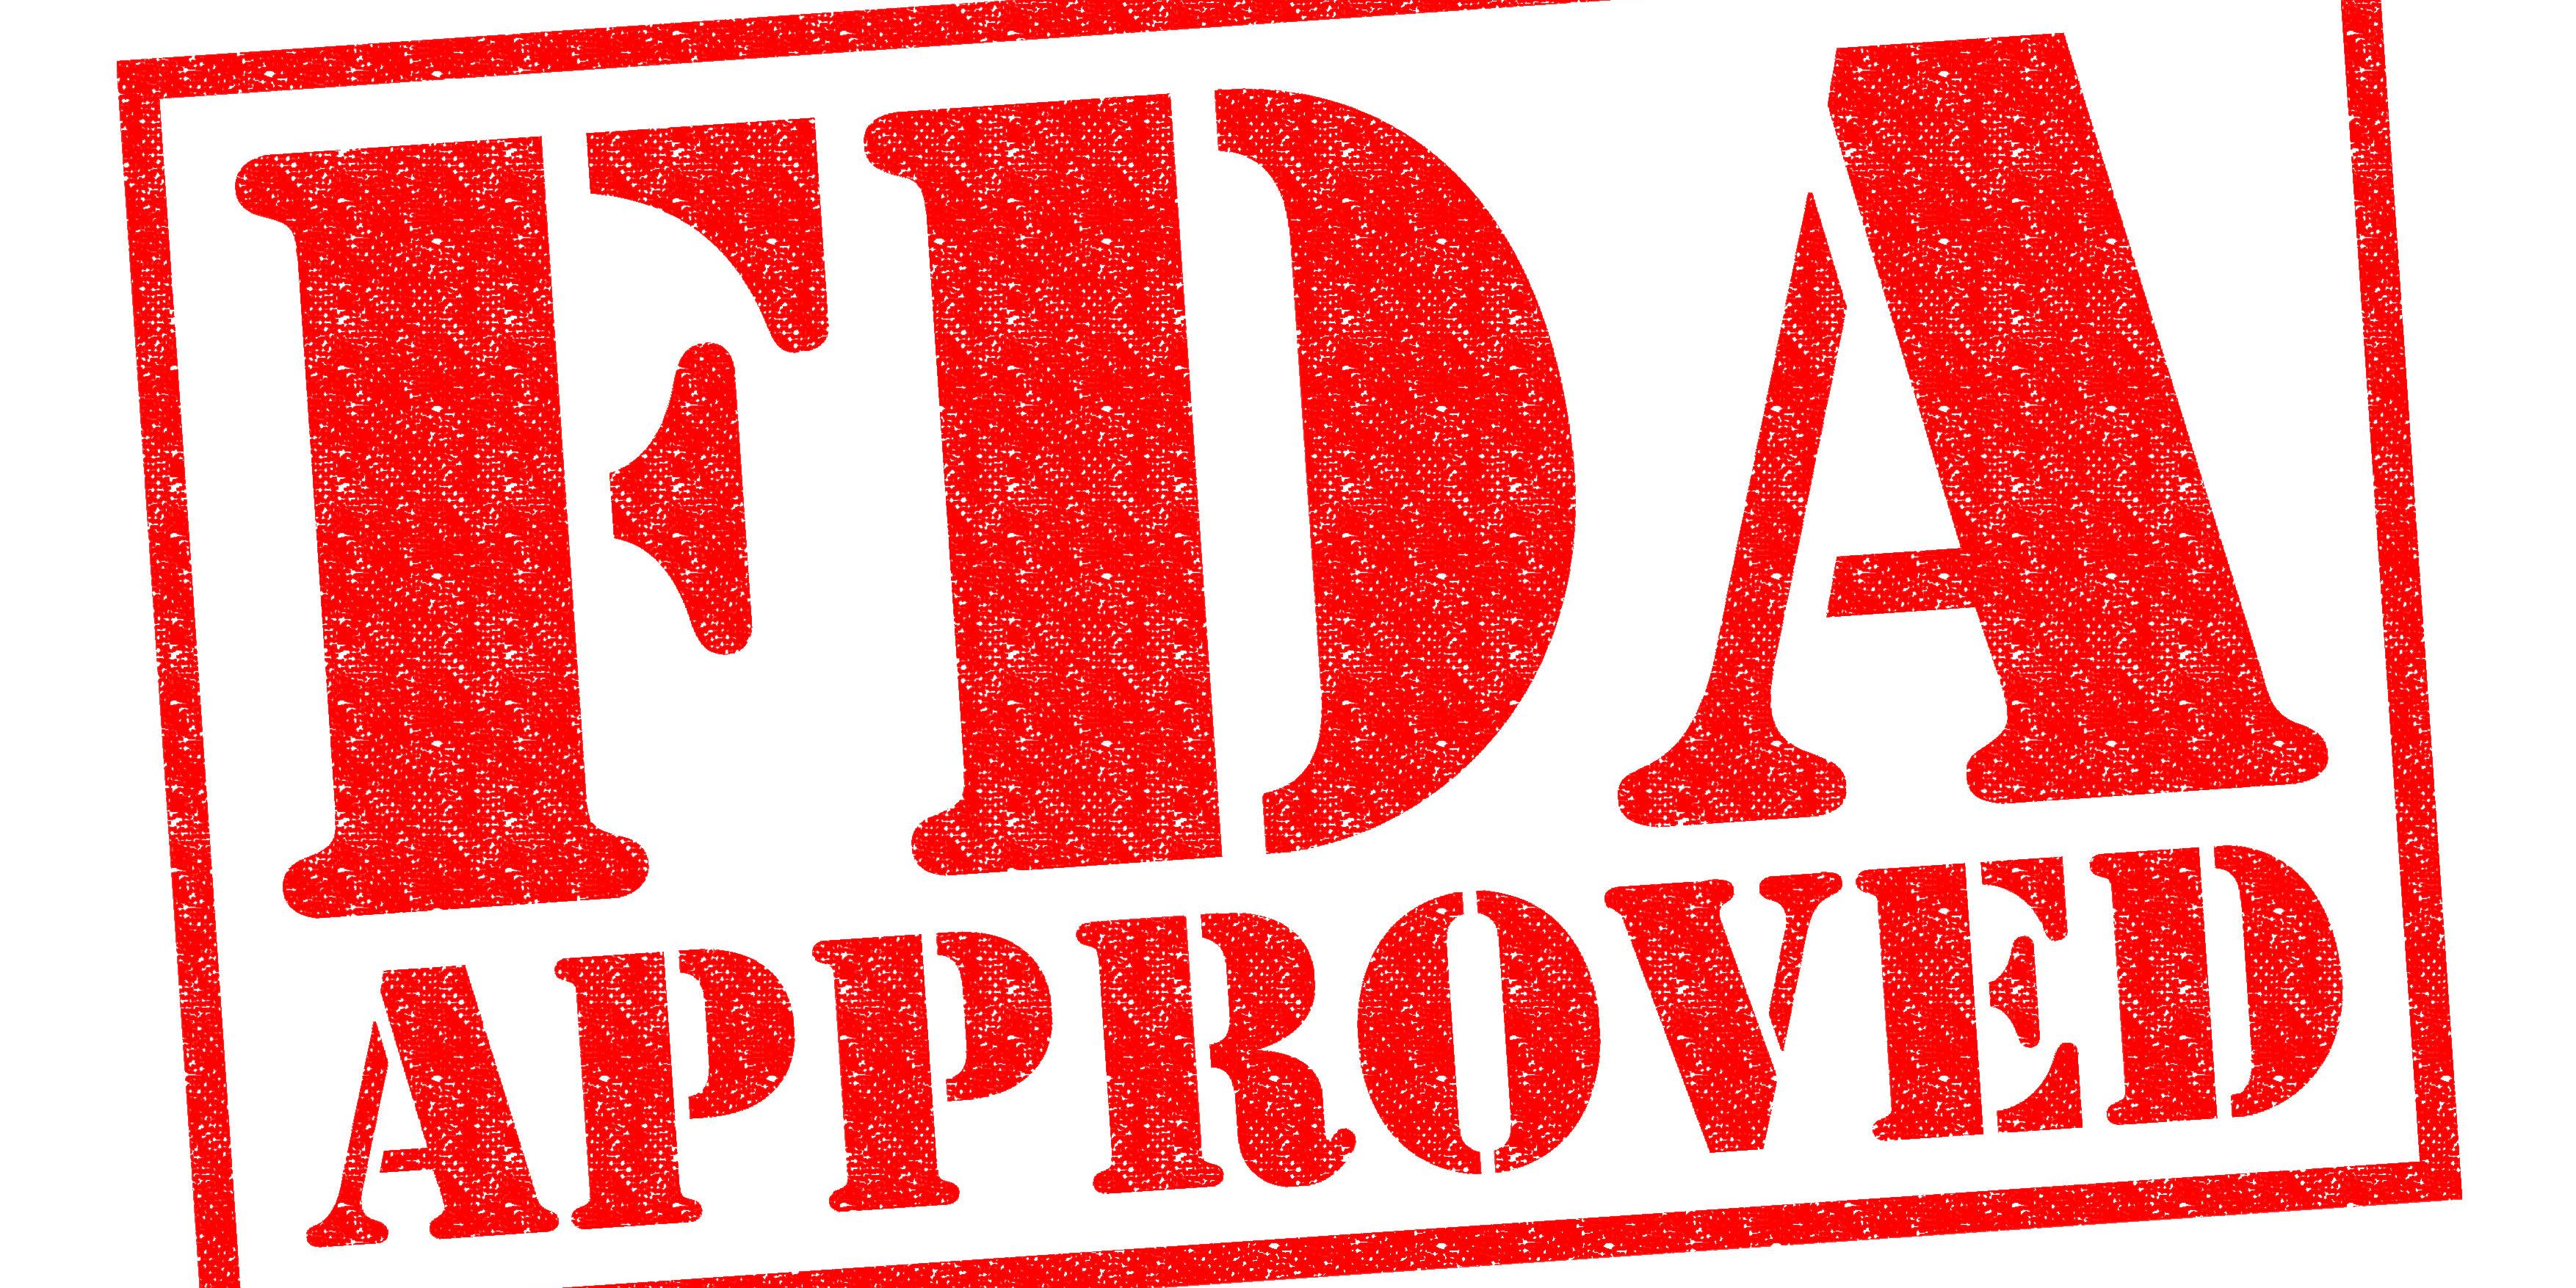 Tell the FDA to Revoke Vaxelis' Approval